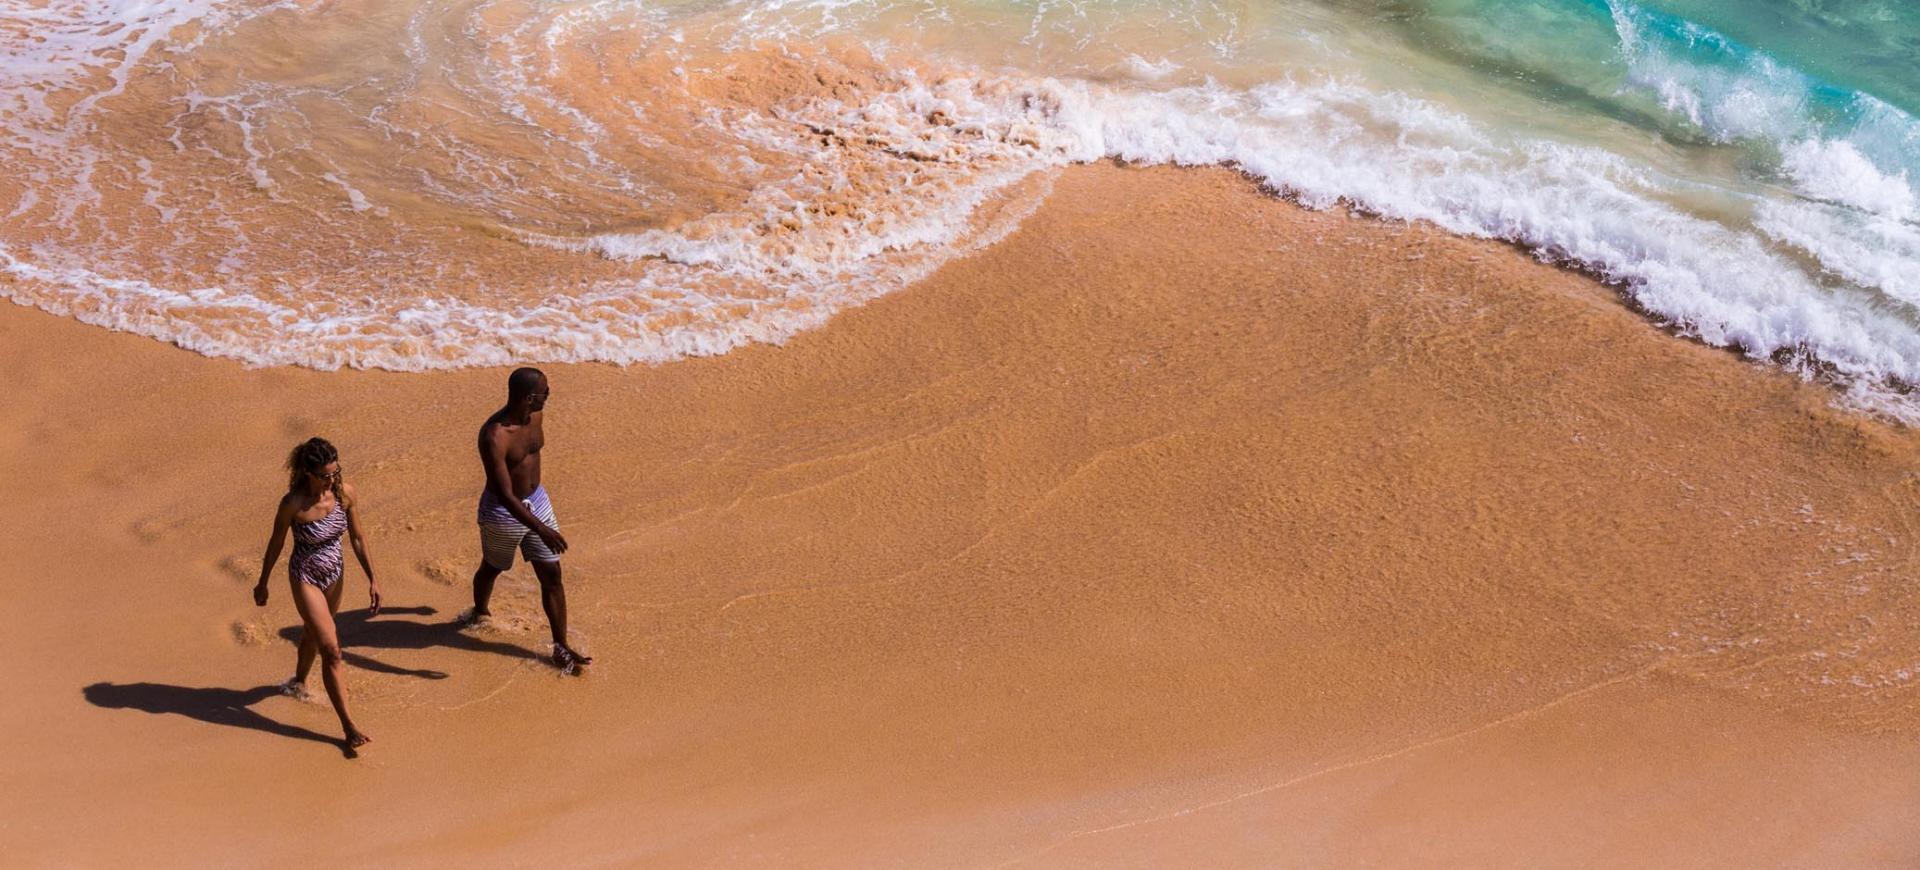 Makena Beach State Park (Big Beach) Maui | Go Hawaii